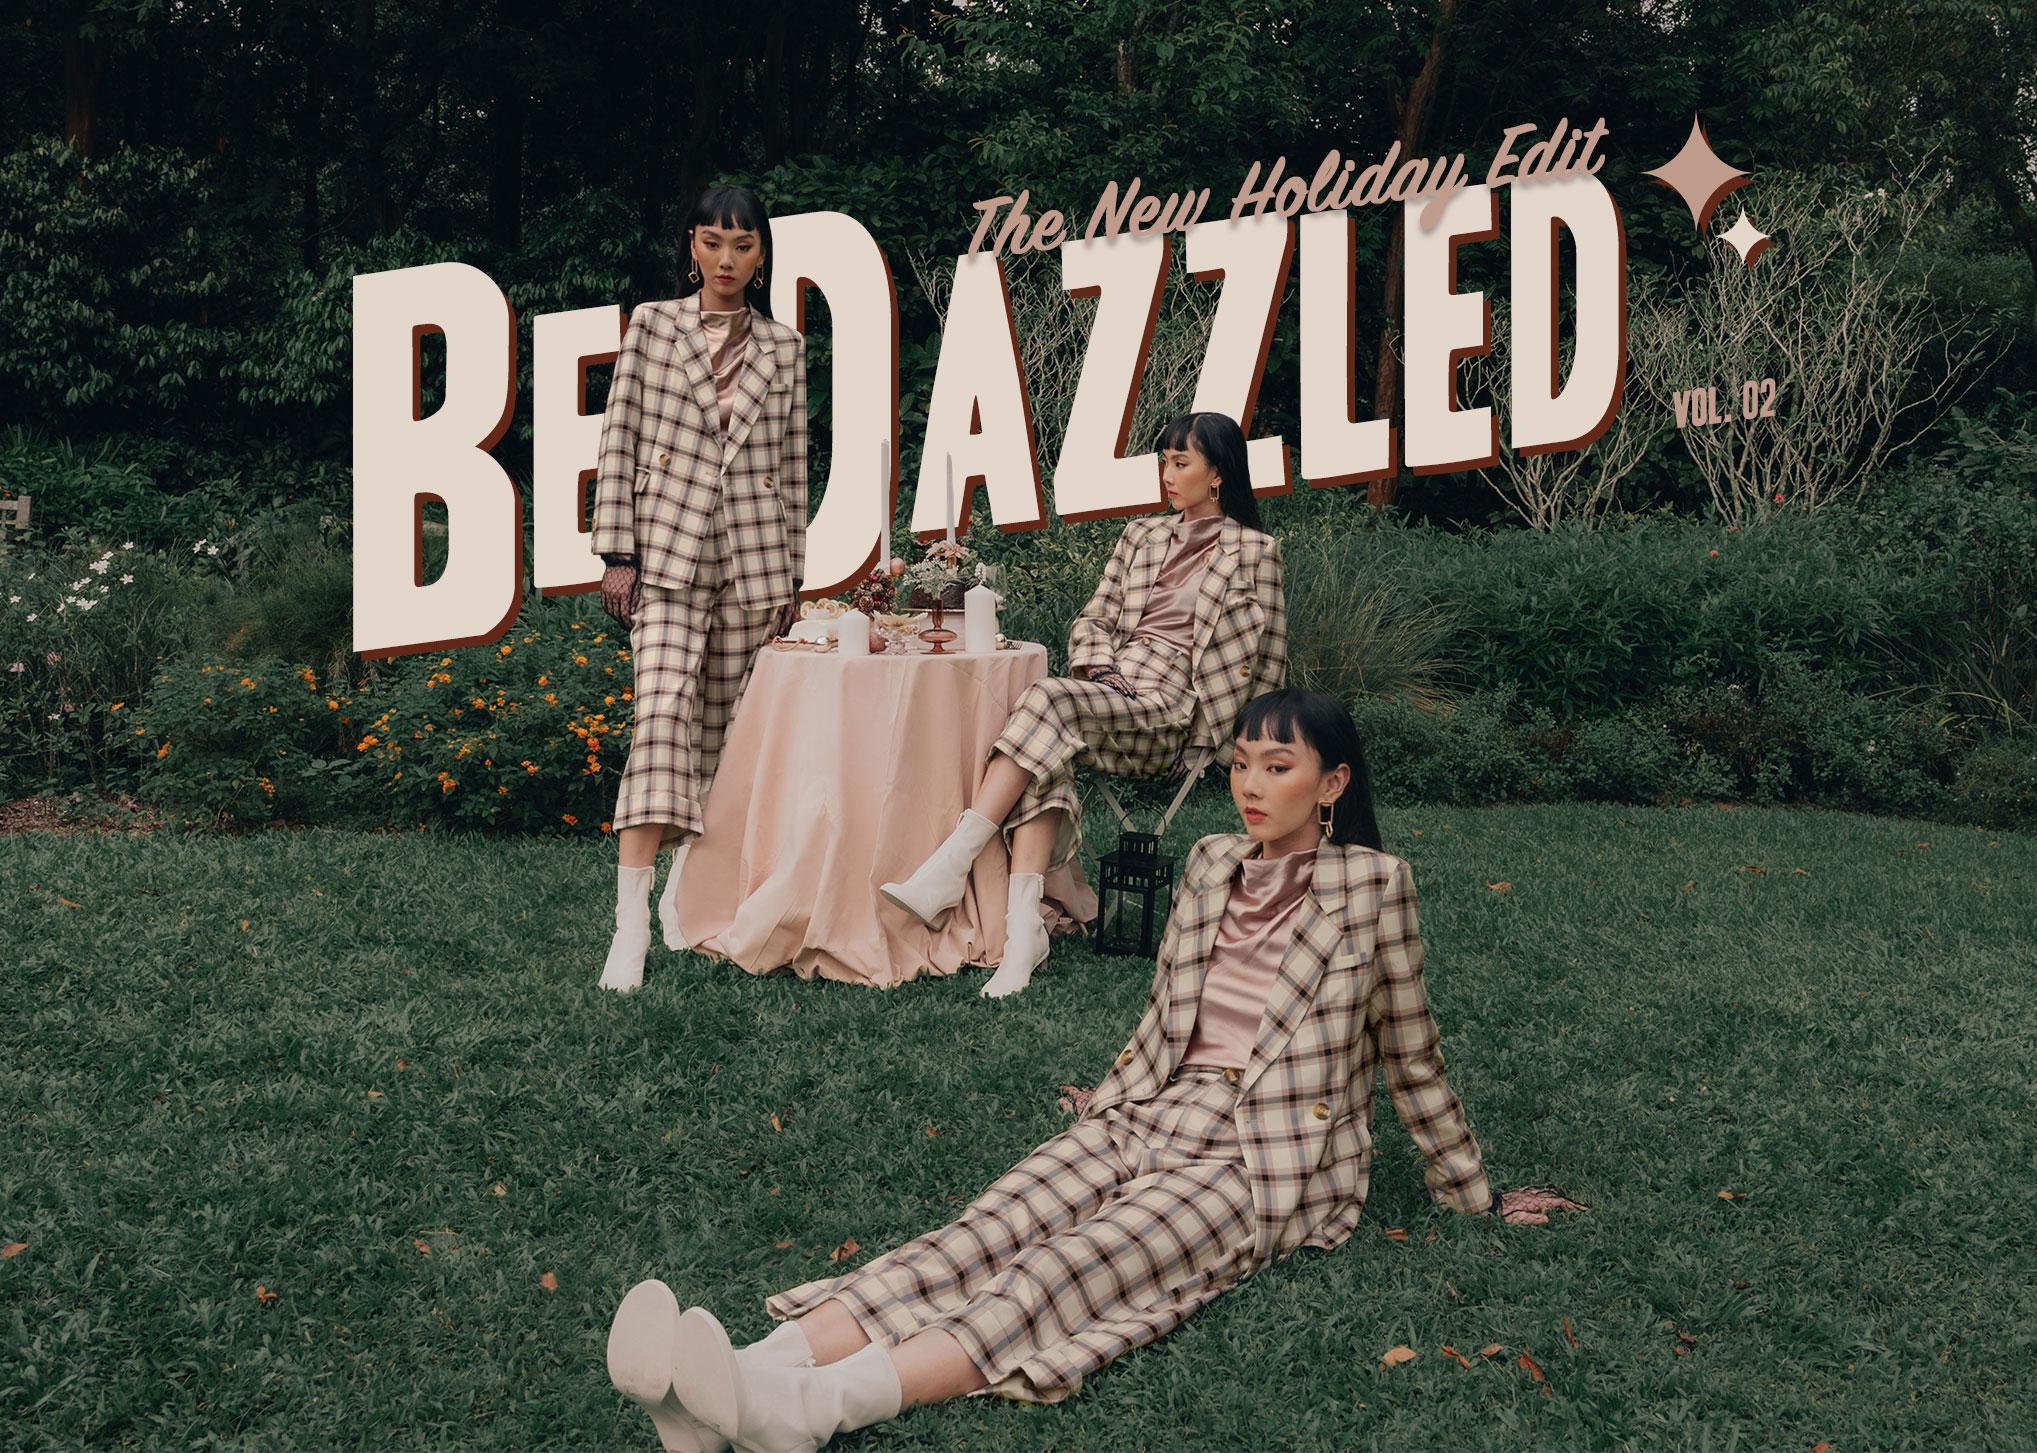 BE-DAZZLED VOL. 02